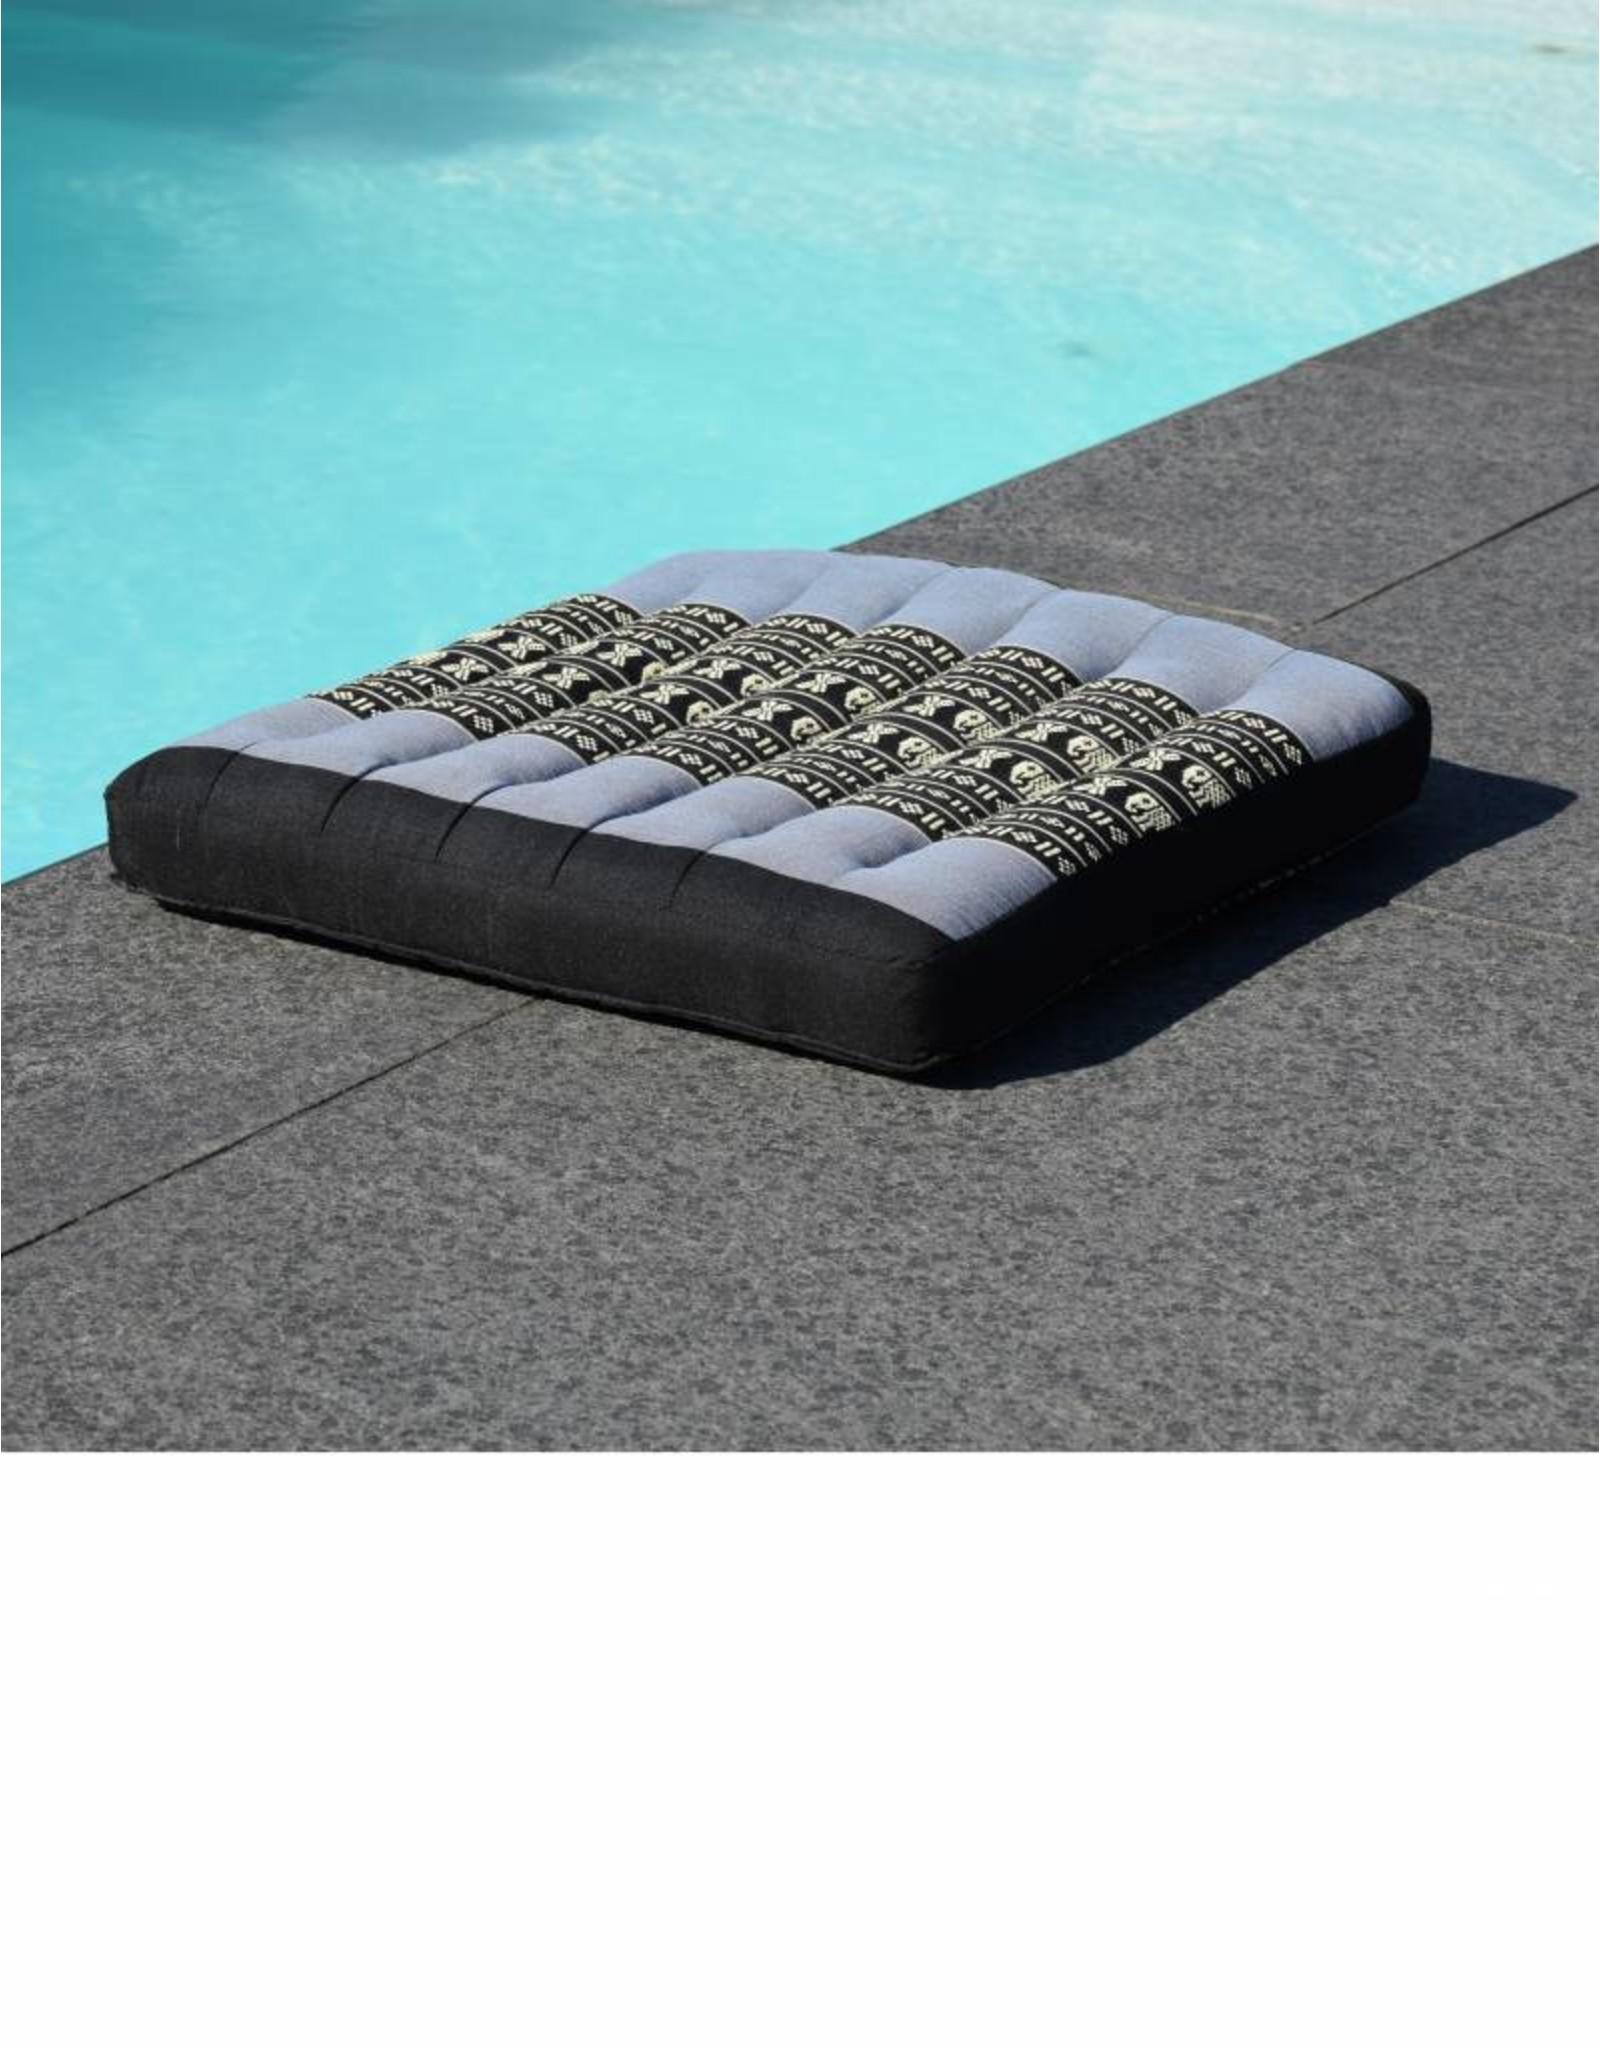 Thai Moonz Thai Seat Cushion and Garden Cushion (Medium/Large) Black/Grey